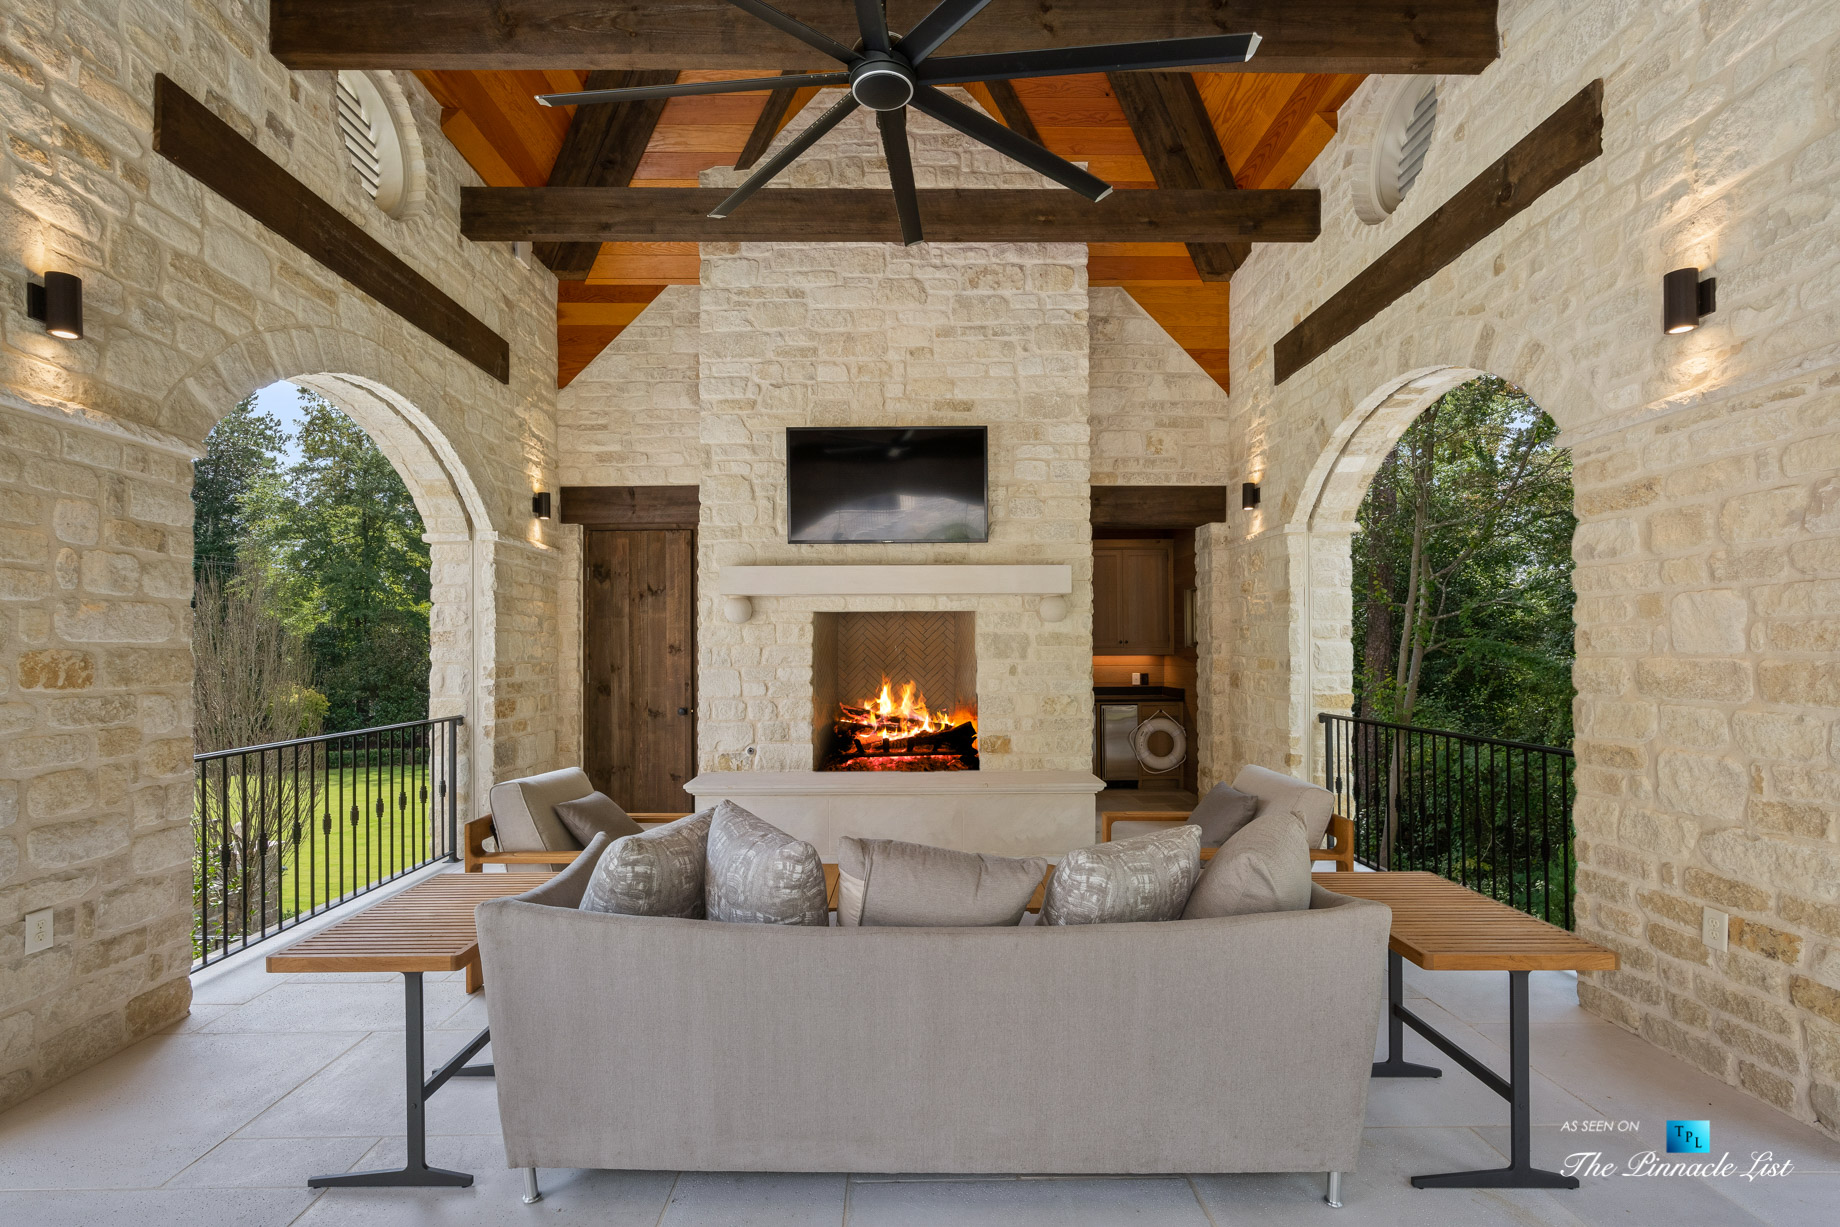 1150 W Garmon Rd, Atlanta, GA, USA – Outdoor Covered Patio with Fireplace – Luxury Real Estate – Buckhead Estate Home